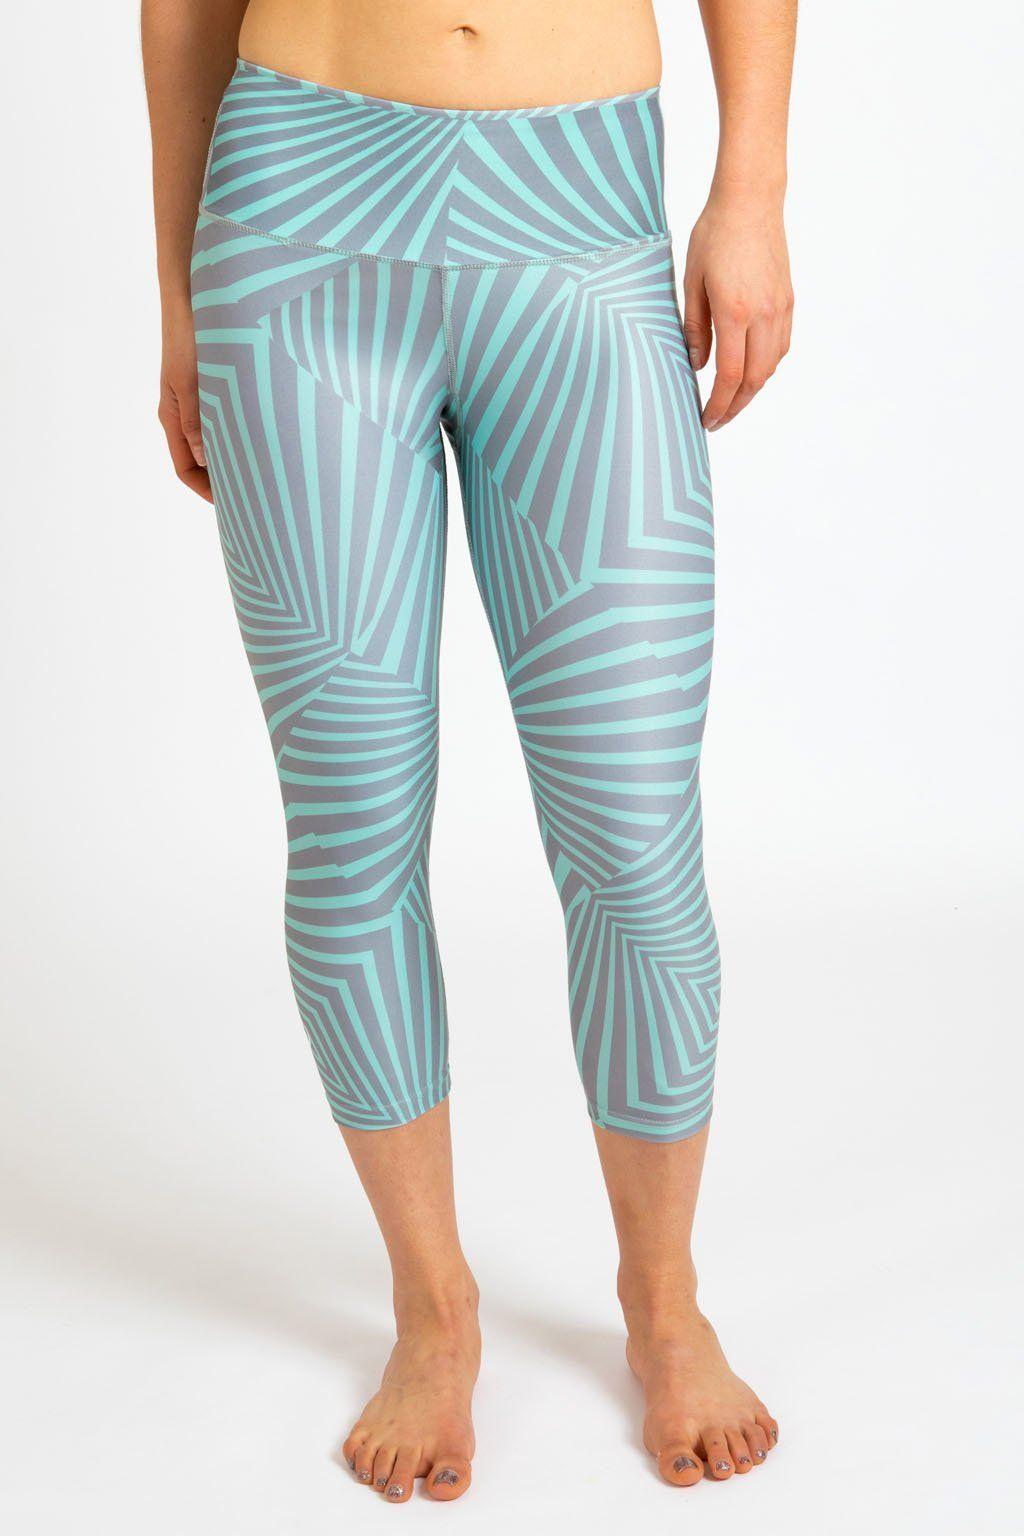 Apex Capri Outfits with leggings, Fitness fashion, Capri